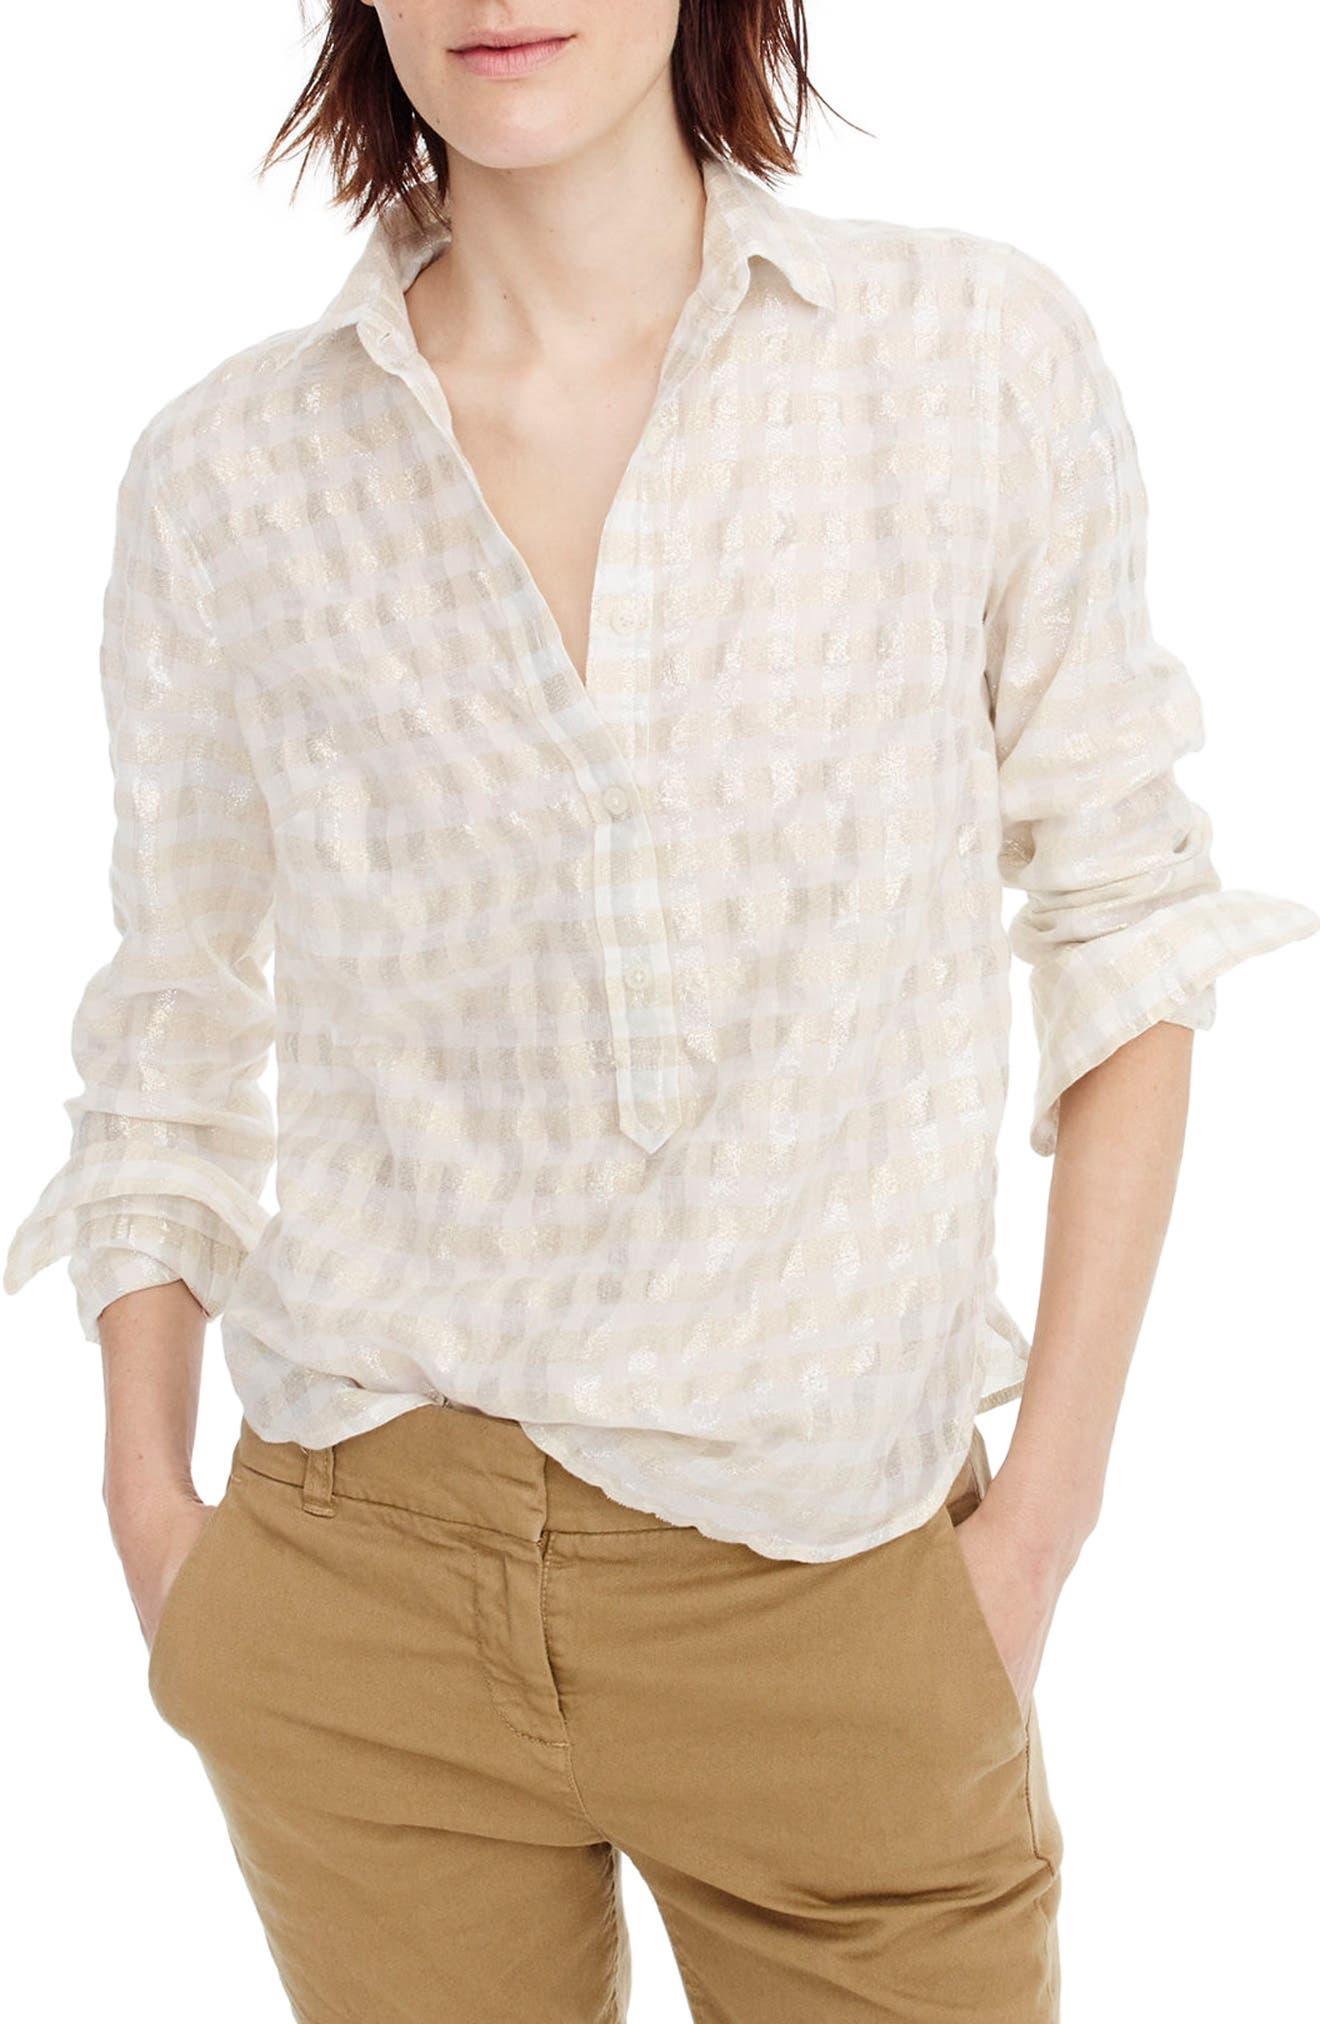 Alternate Image 1 Selected - J.Crew Metallic Cotton Voile Popover Shirt (Regular & Petite)